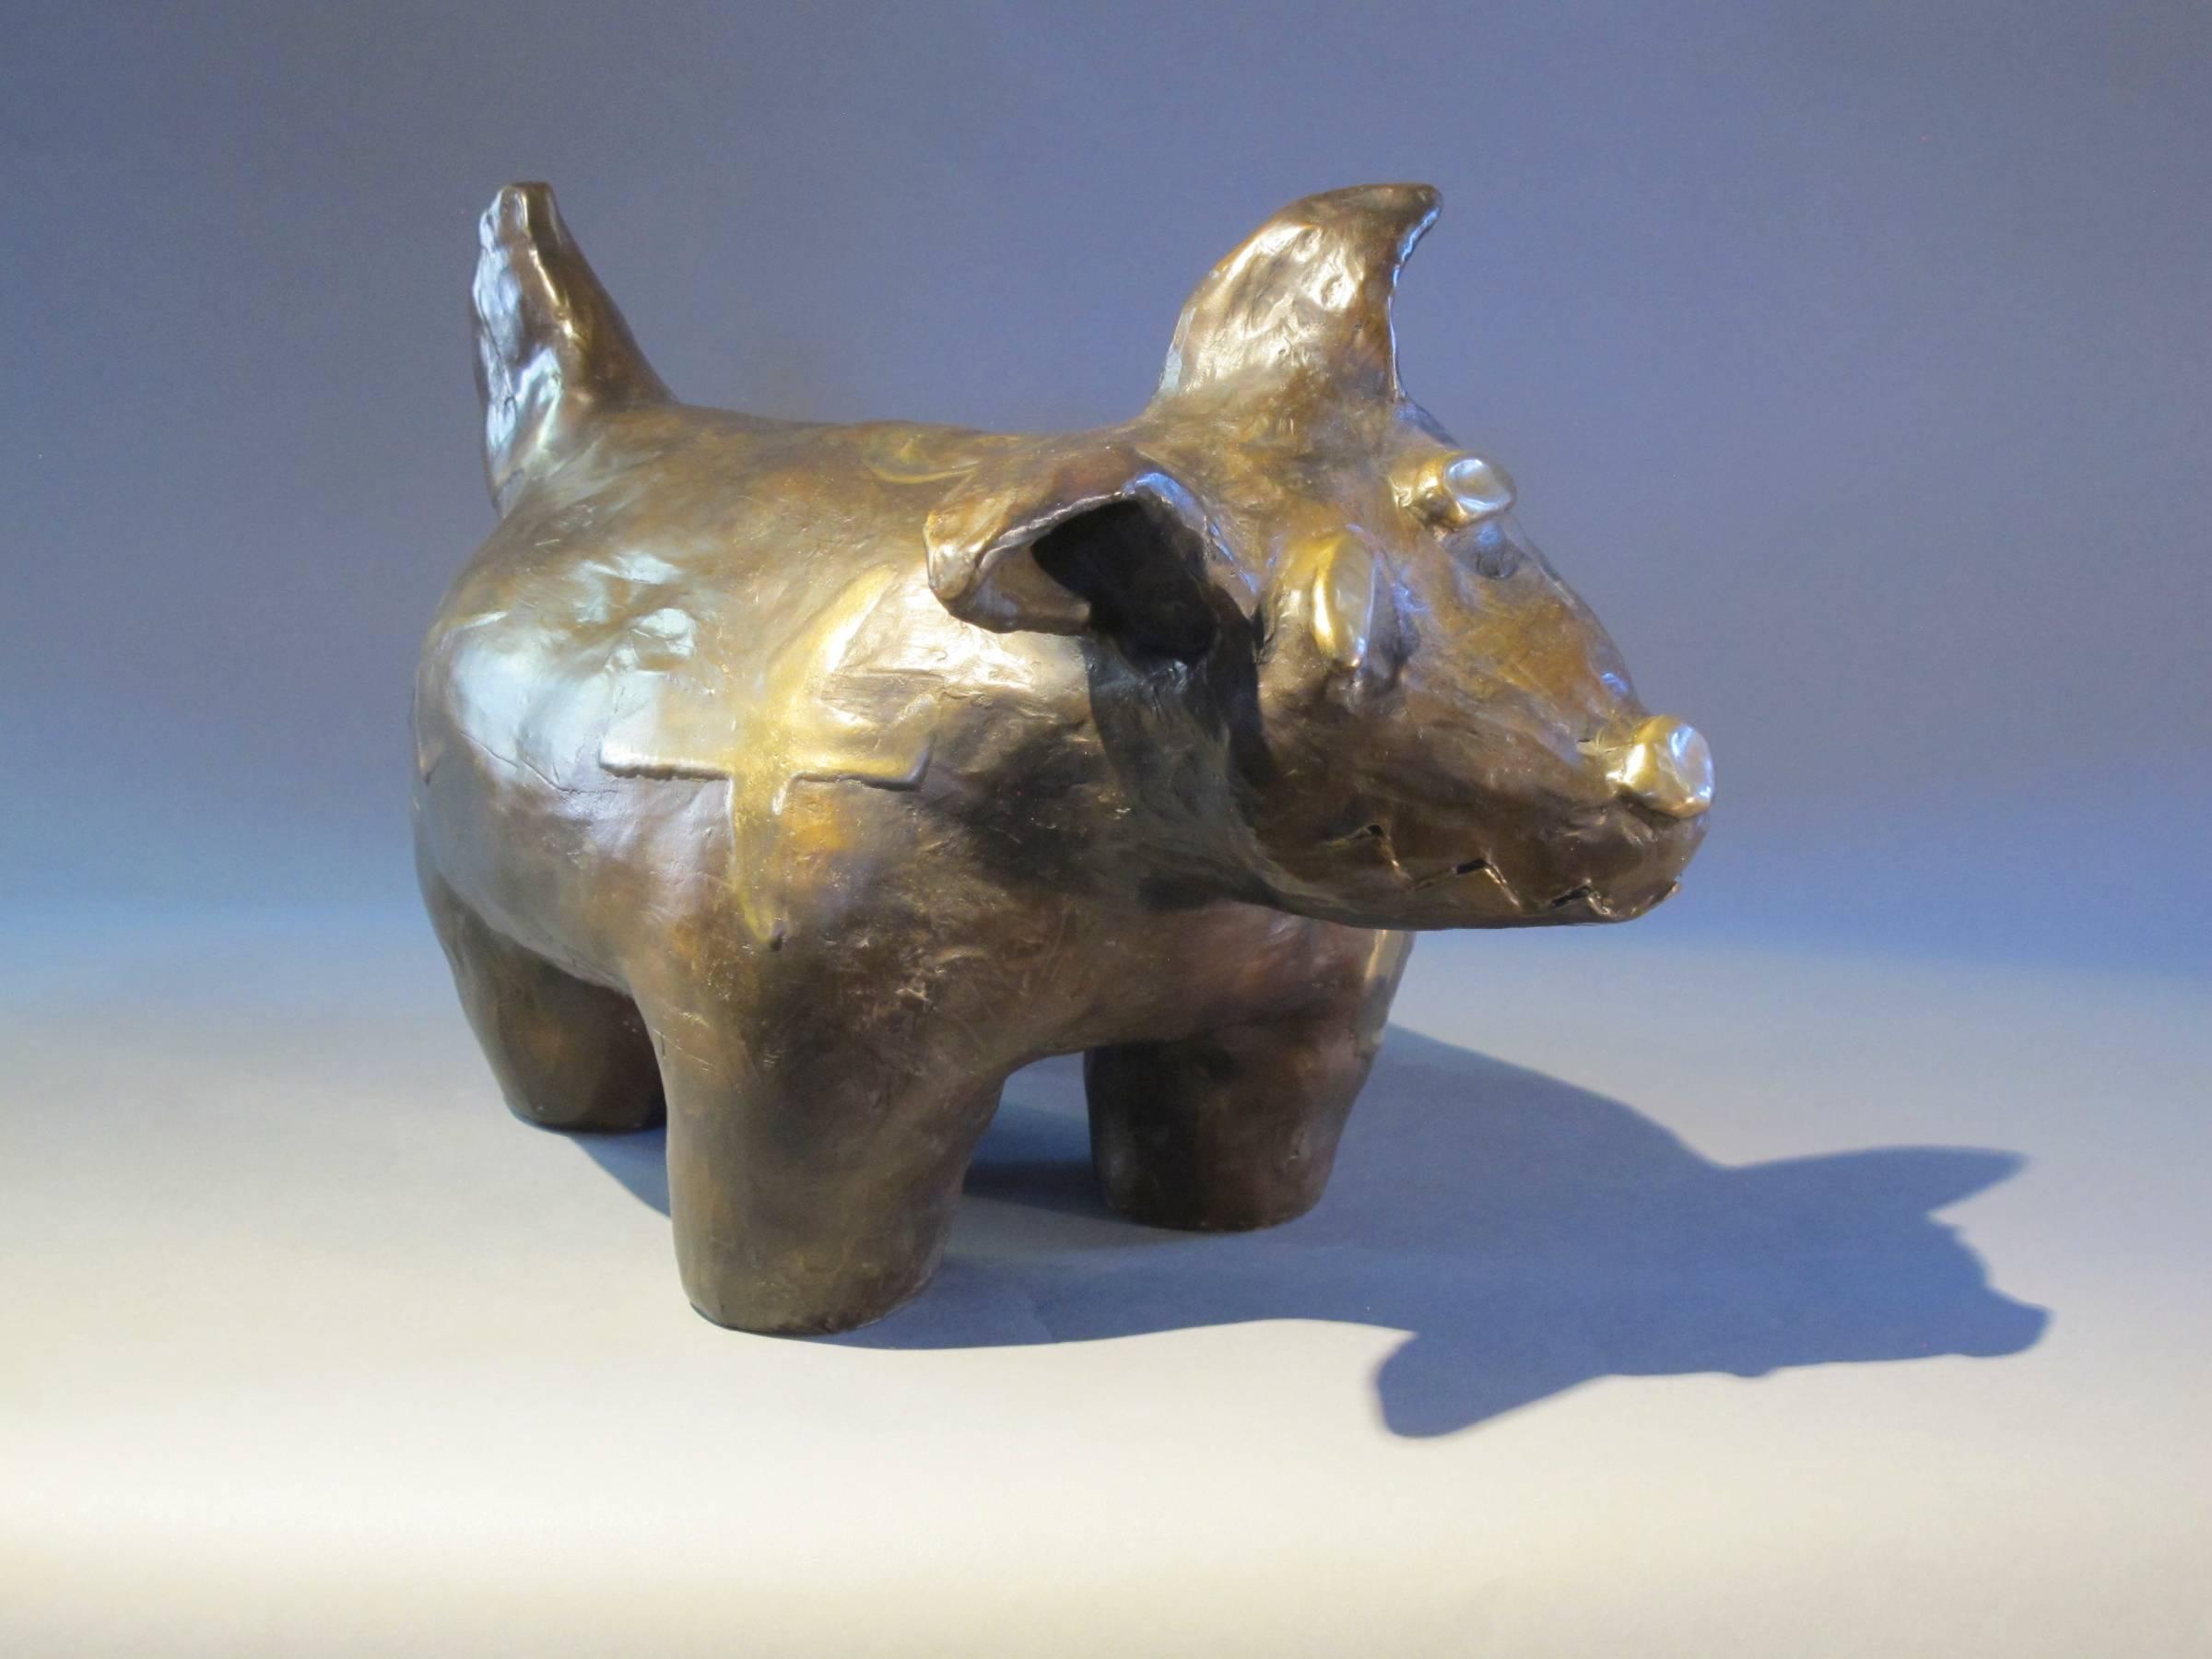 Levi Blacksheep Dreams of Flying, bronze dog, airplanes,Navajo,gold tones Native